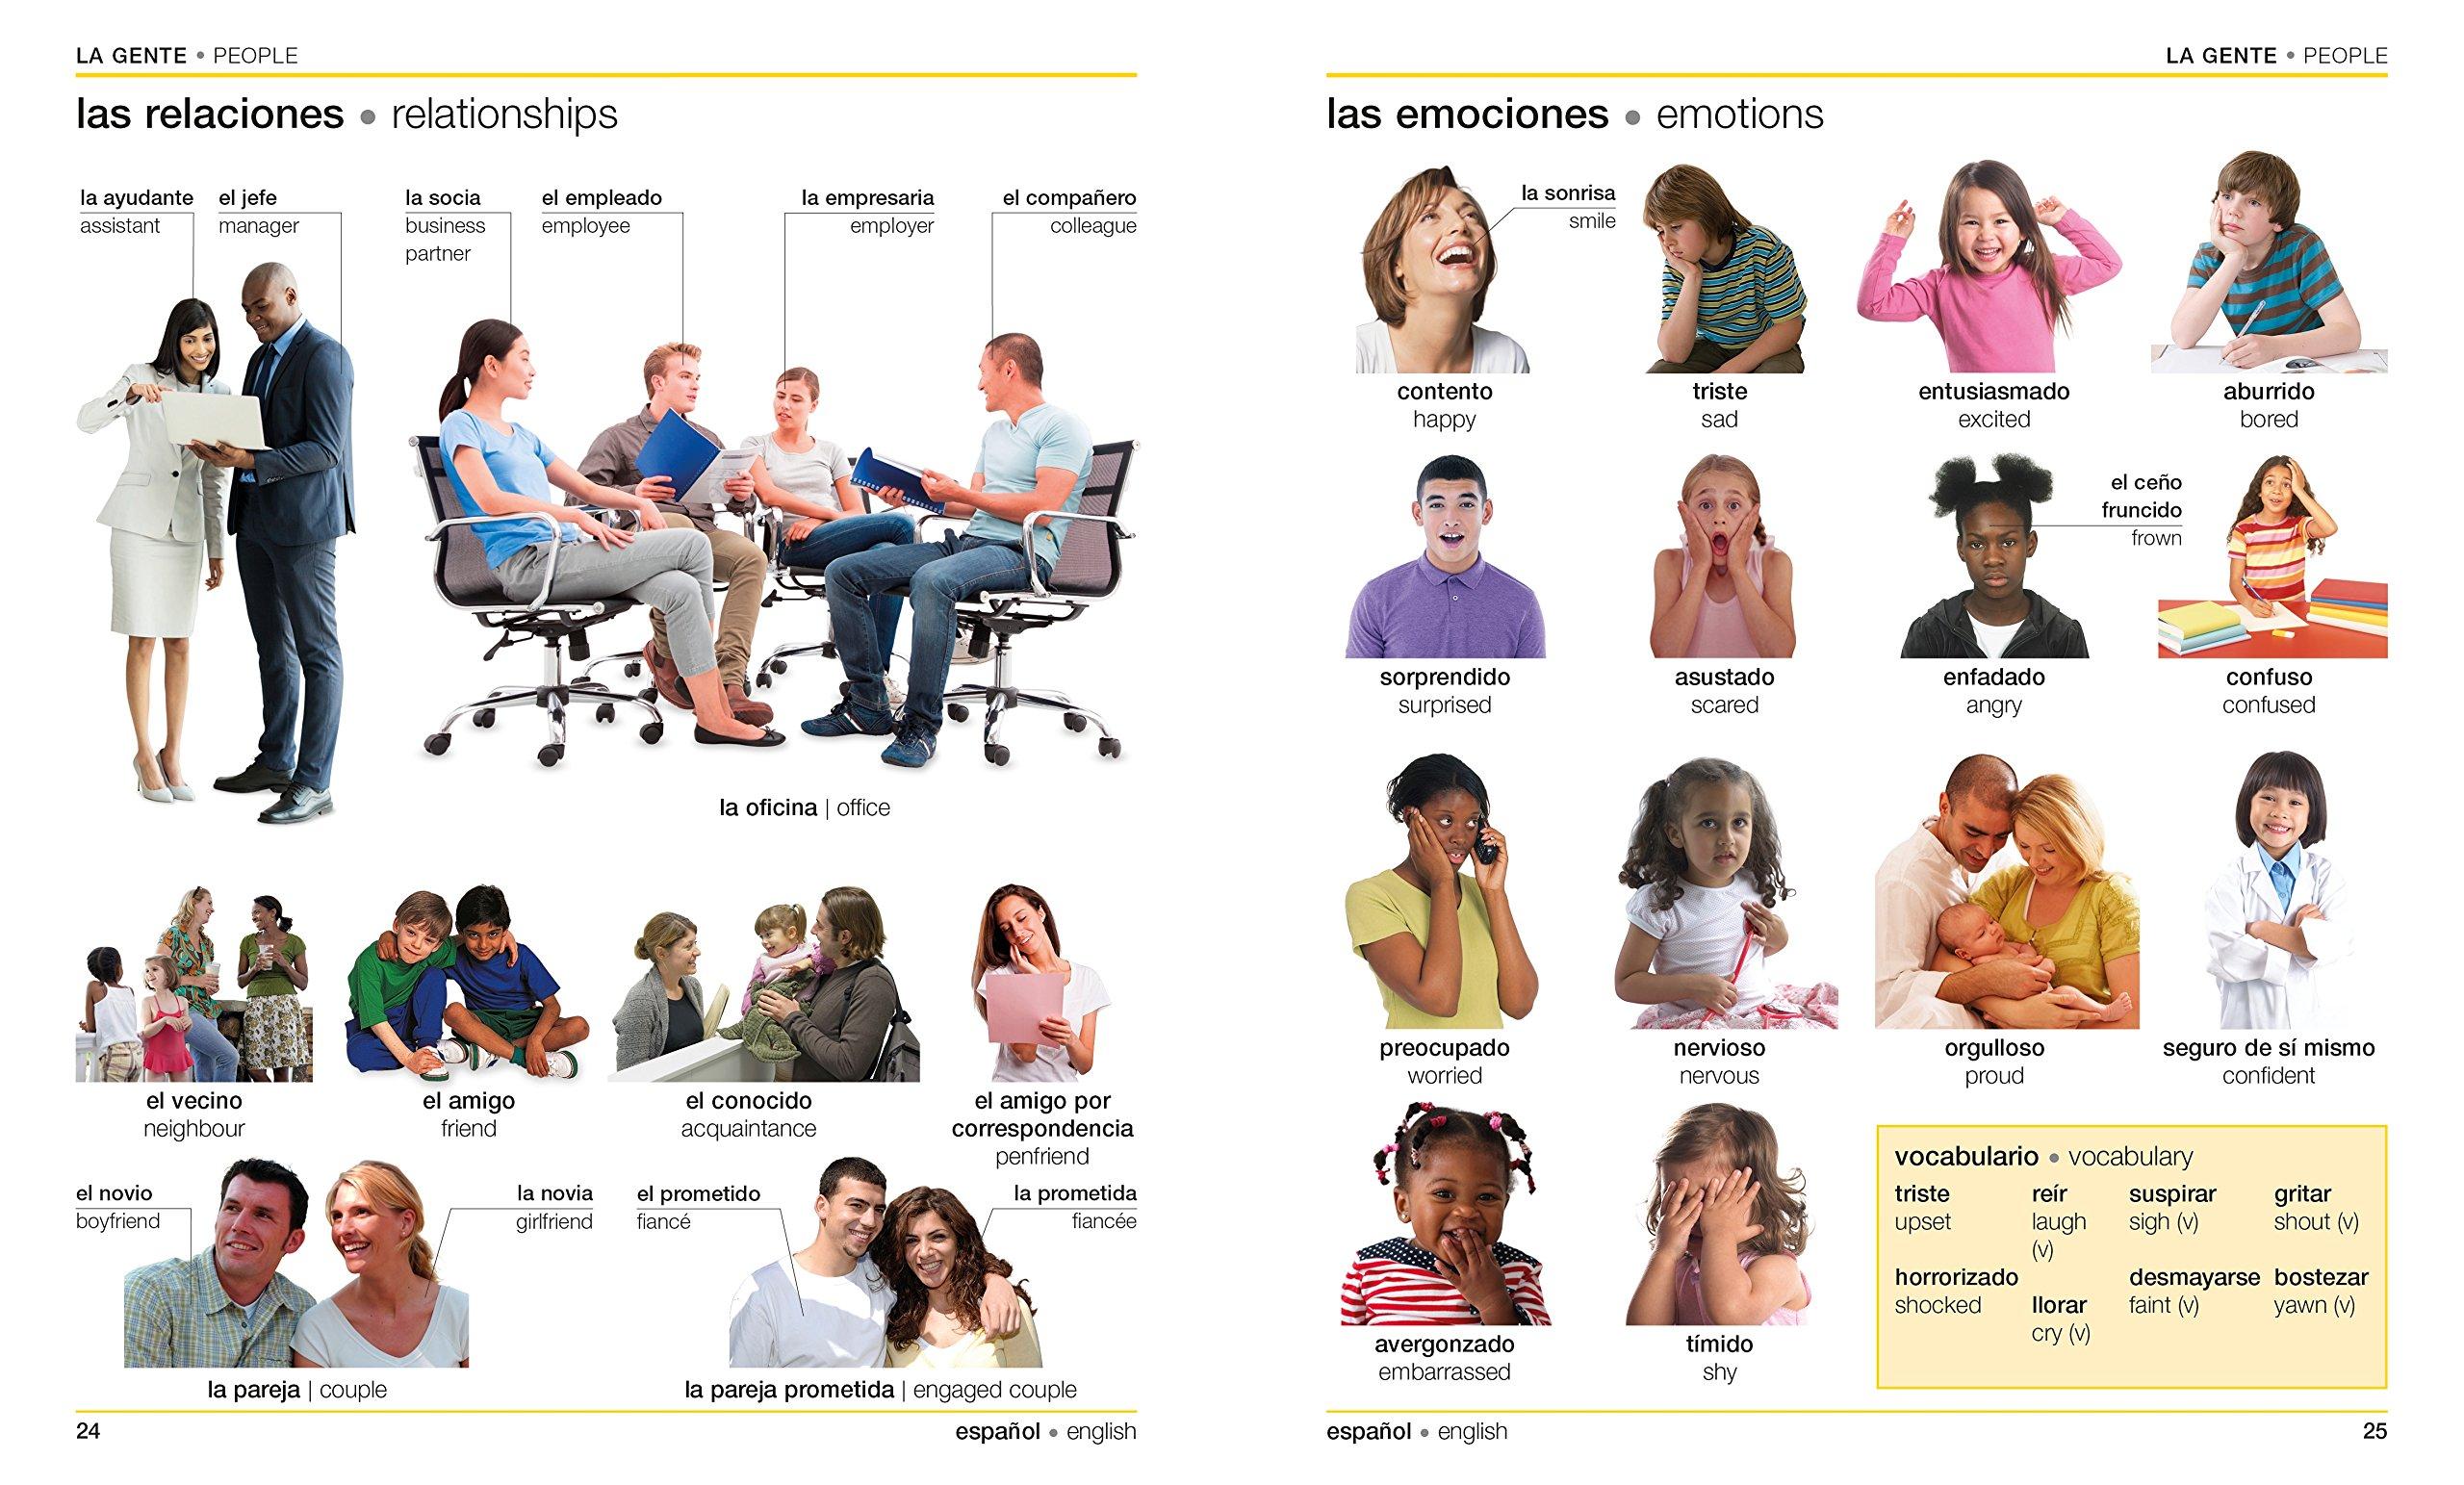 Spanish english bilingual visual dictionary dk bilingual dictionaries amazon co uk dk 9780241199206 books